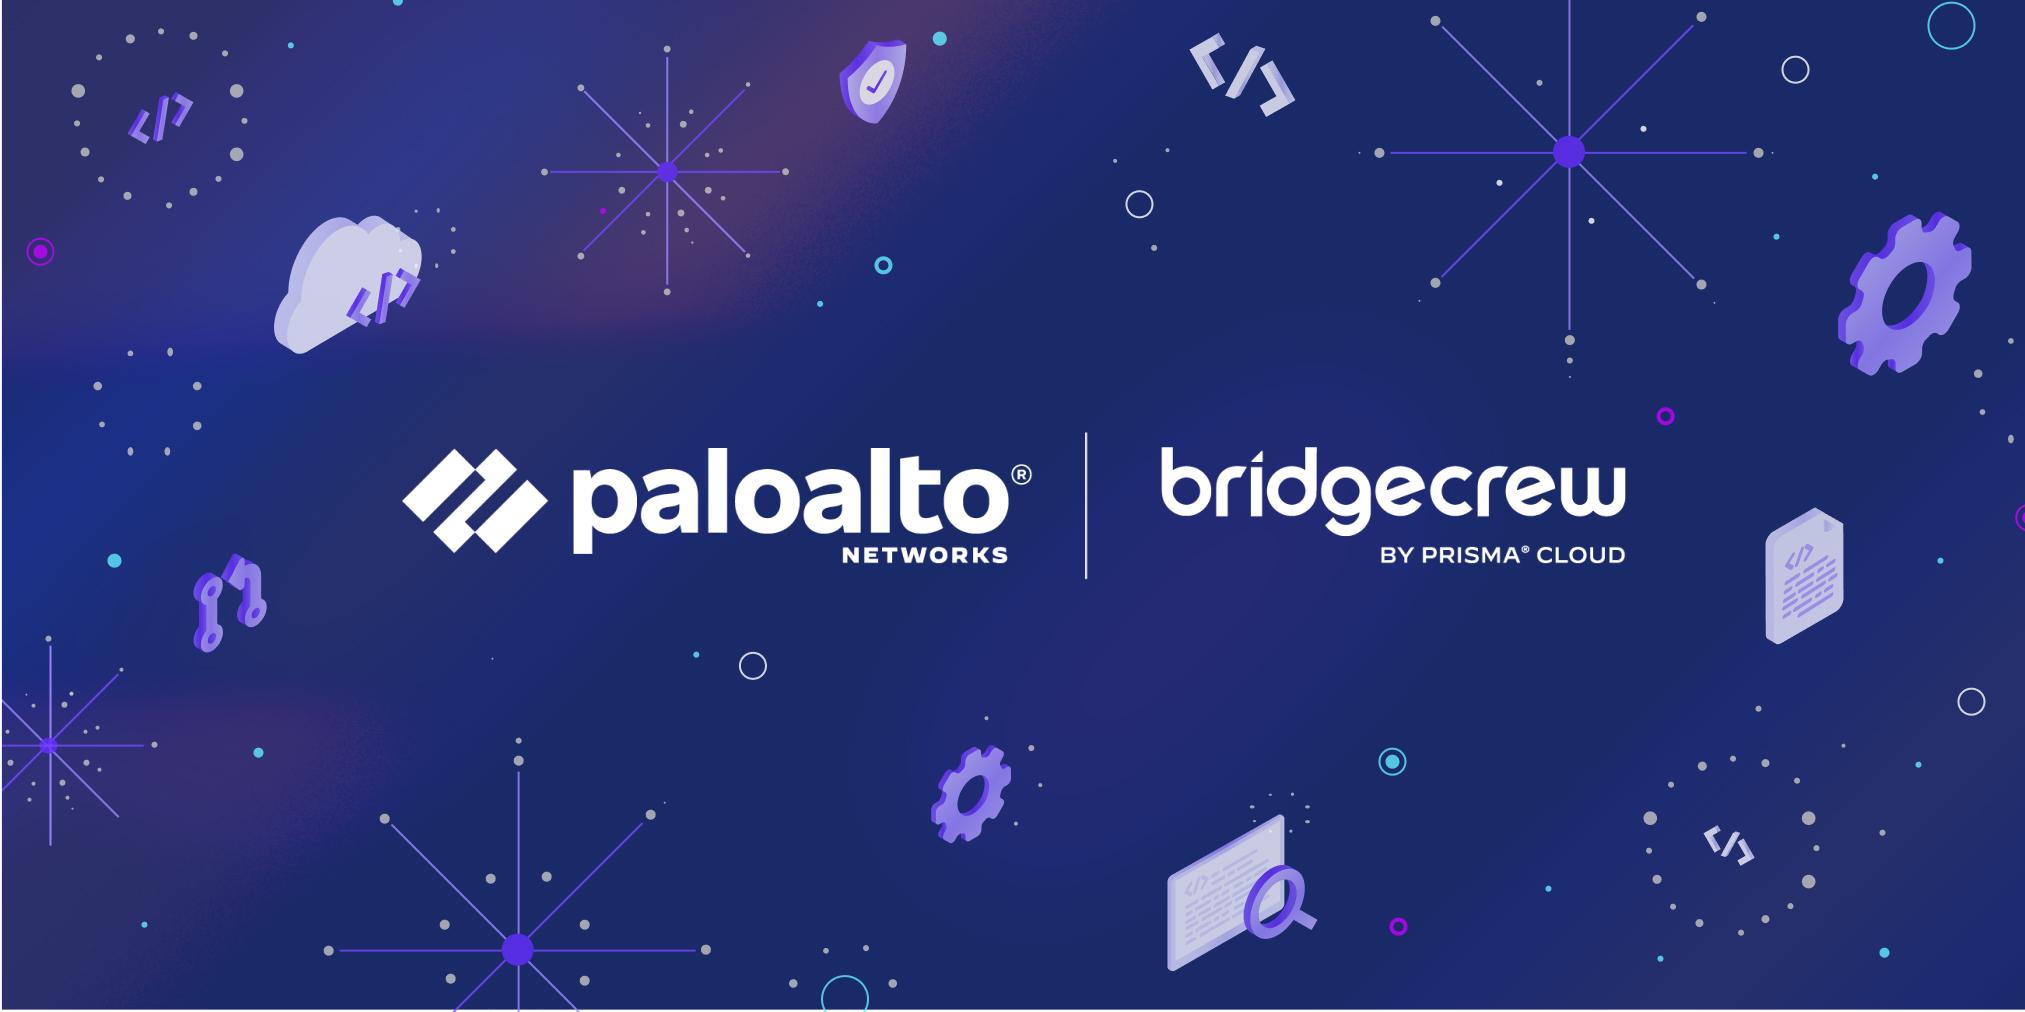 Palo Alto Networks and Bridgecrew